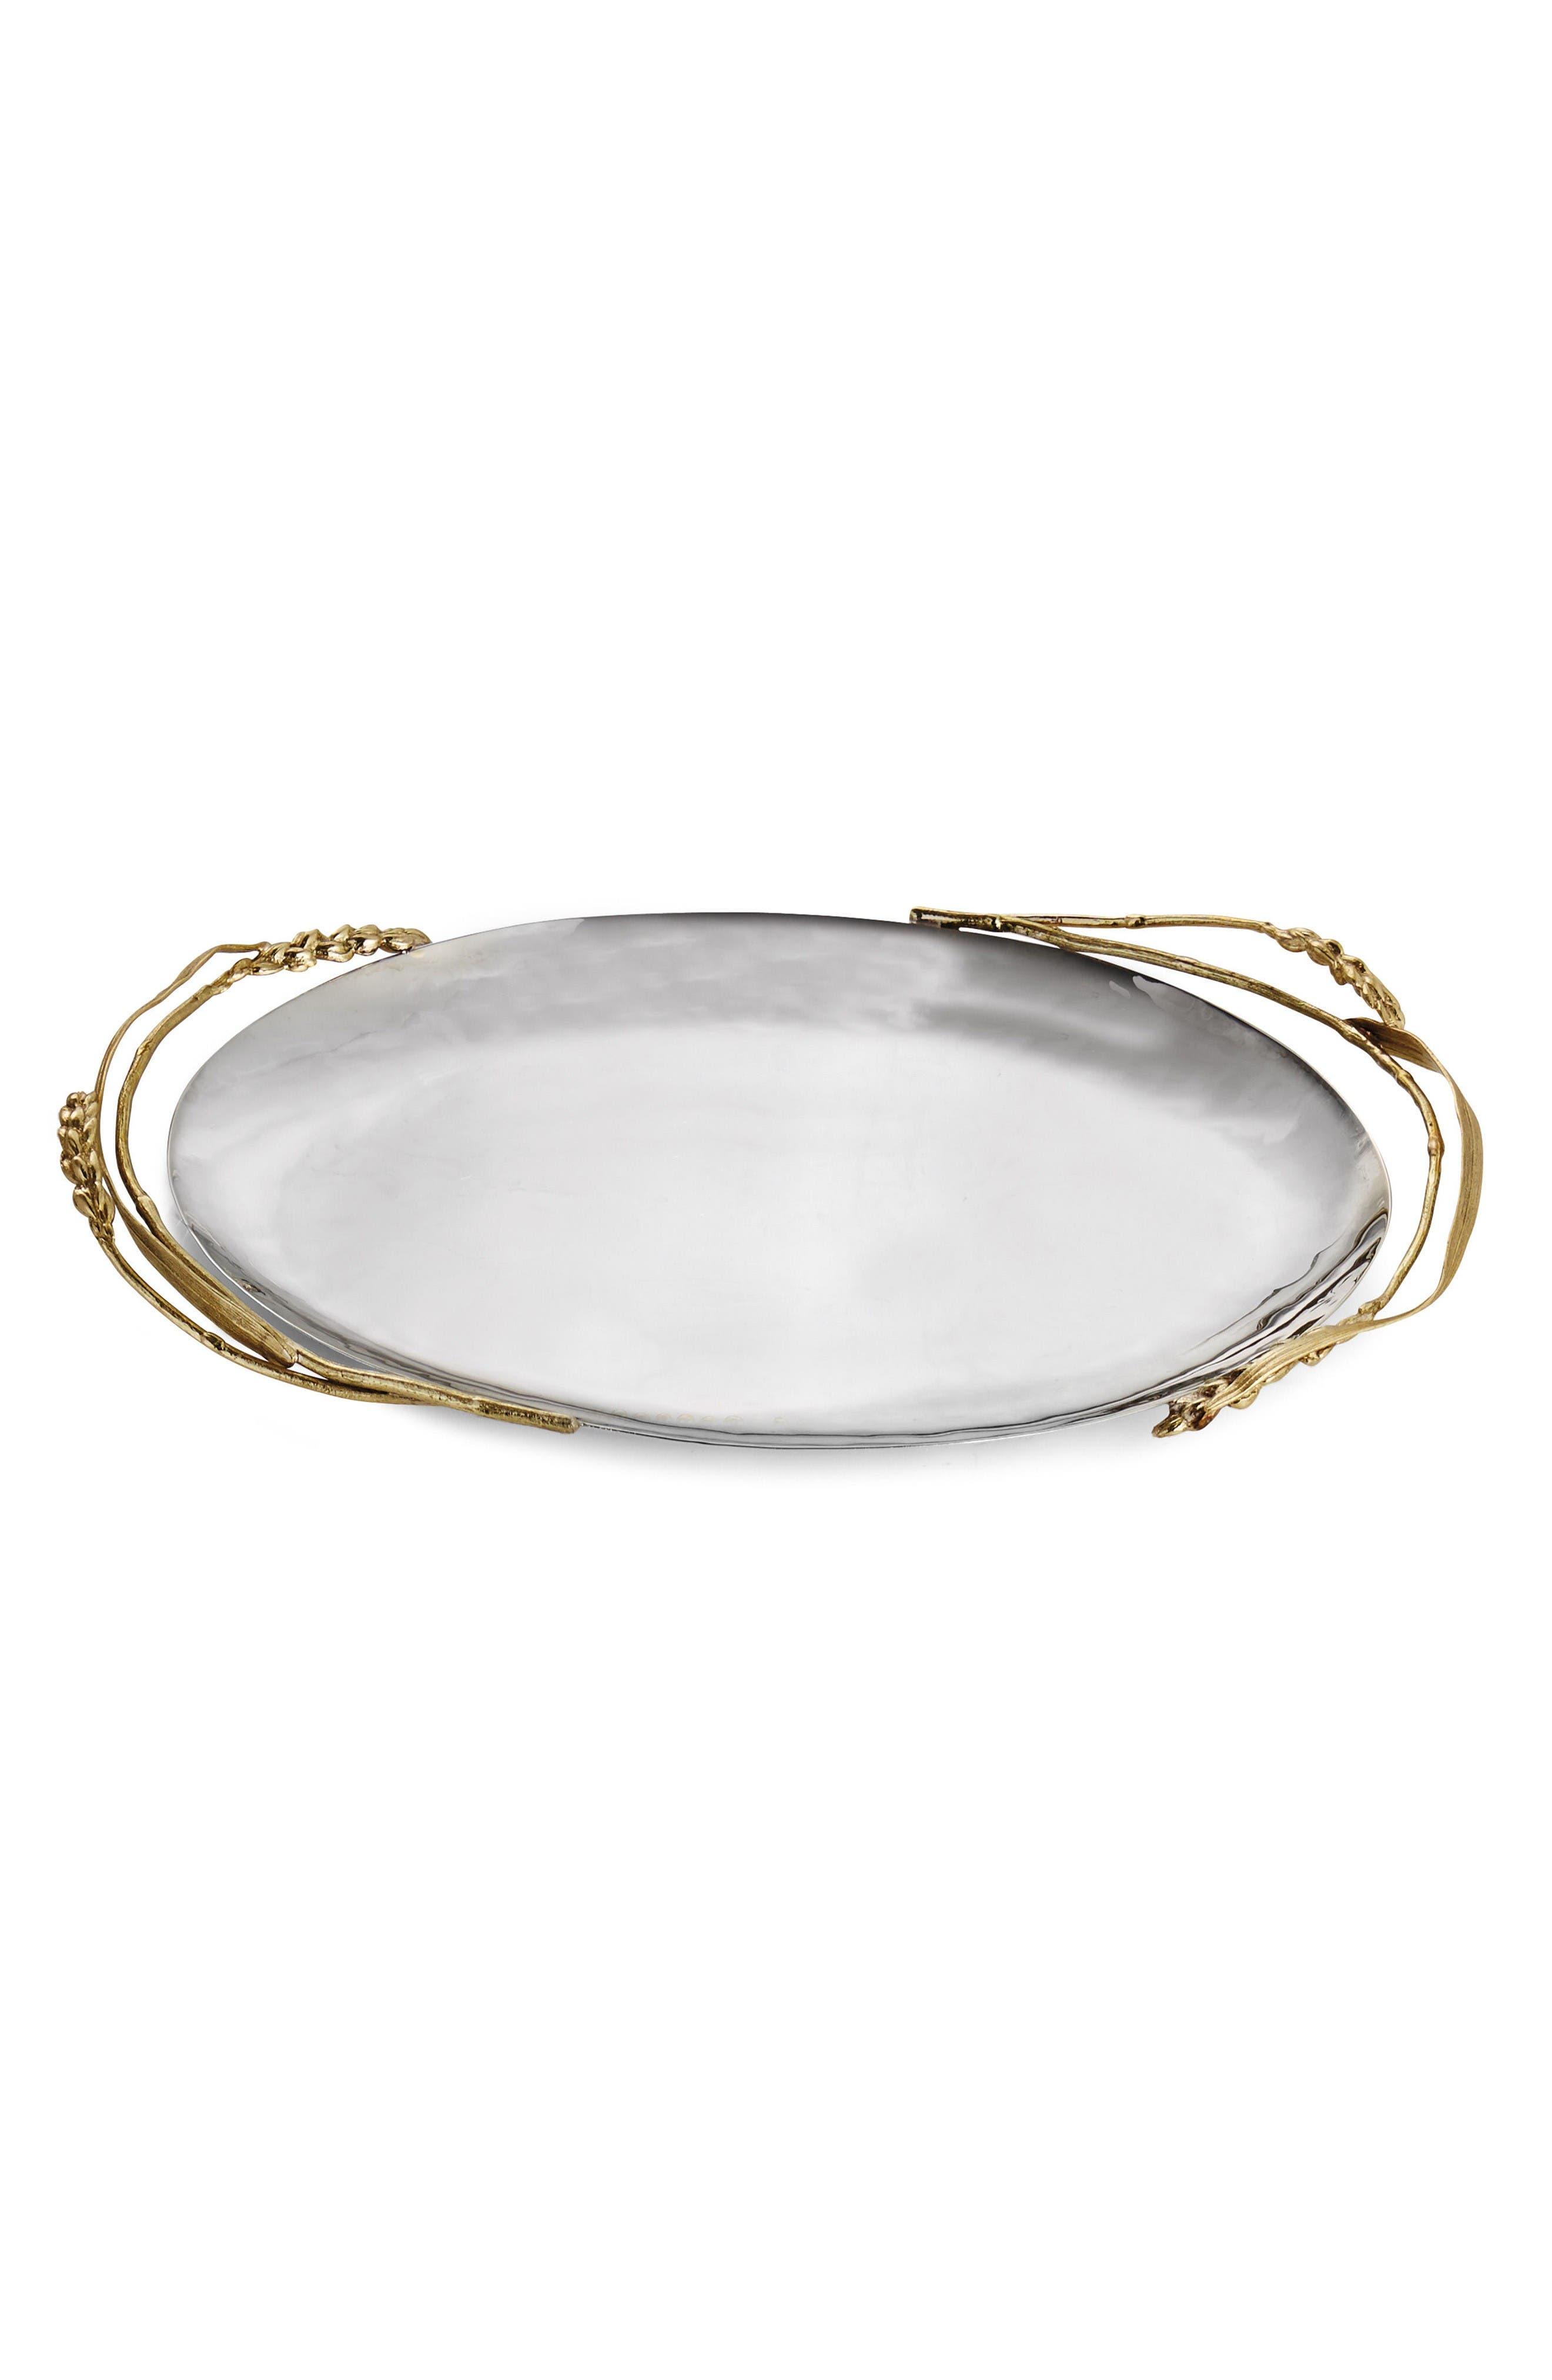 Michael Aram Wheat Oval Platter